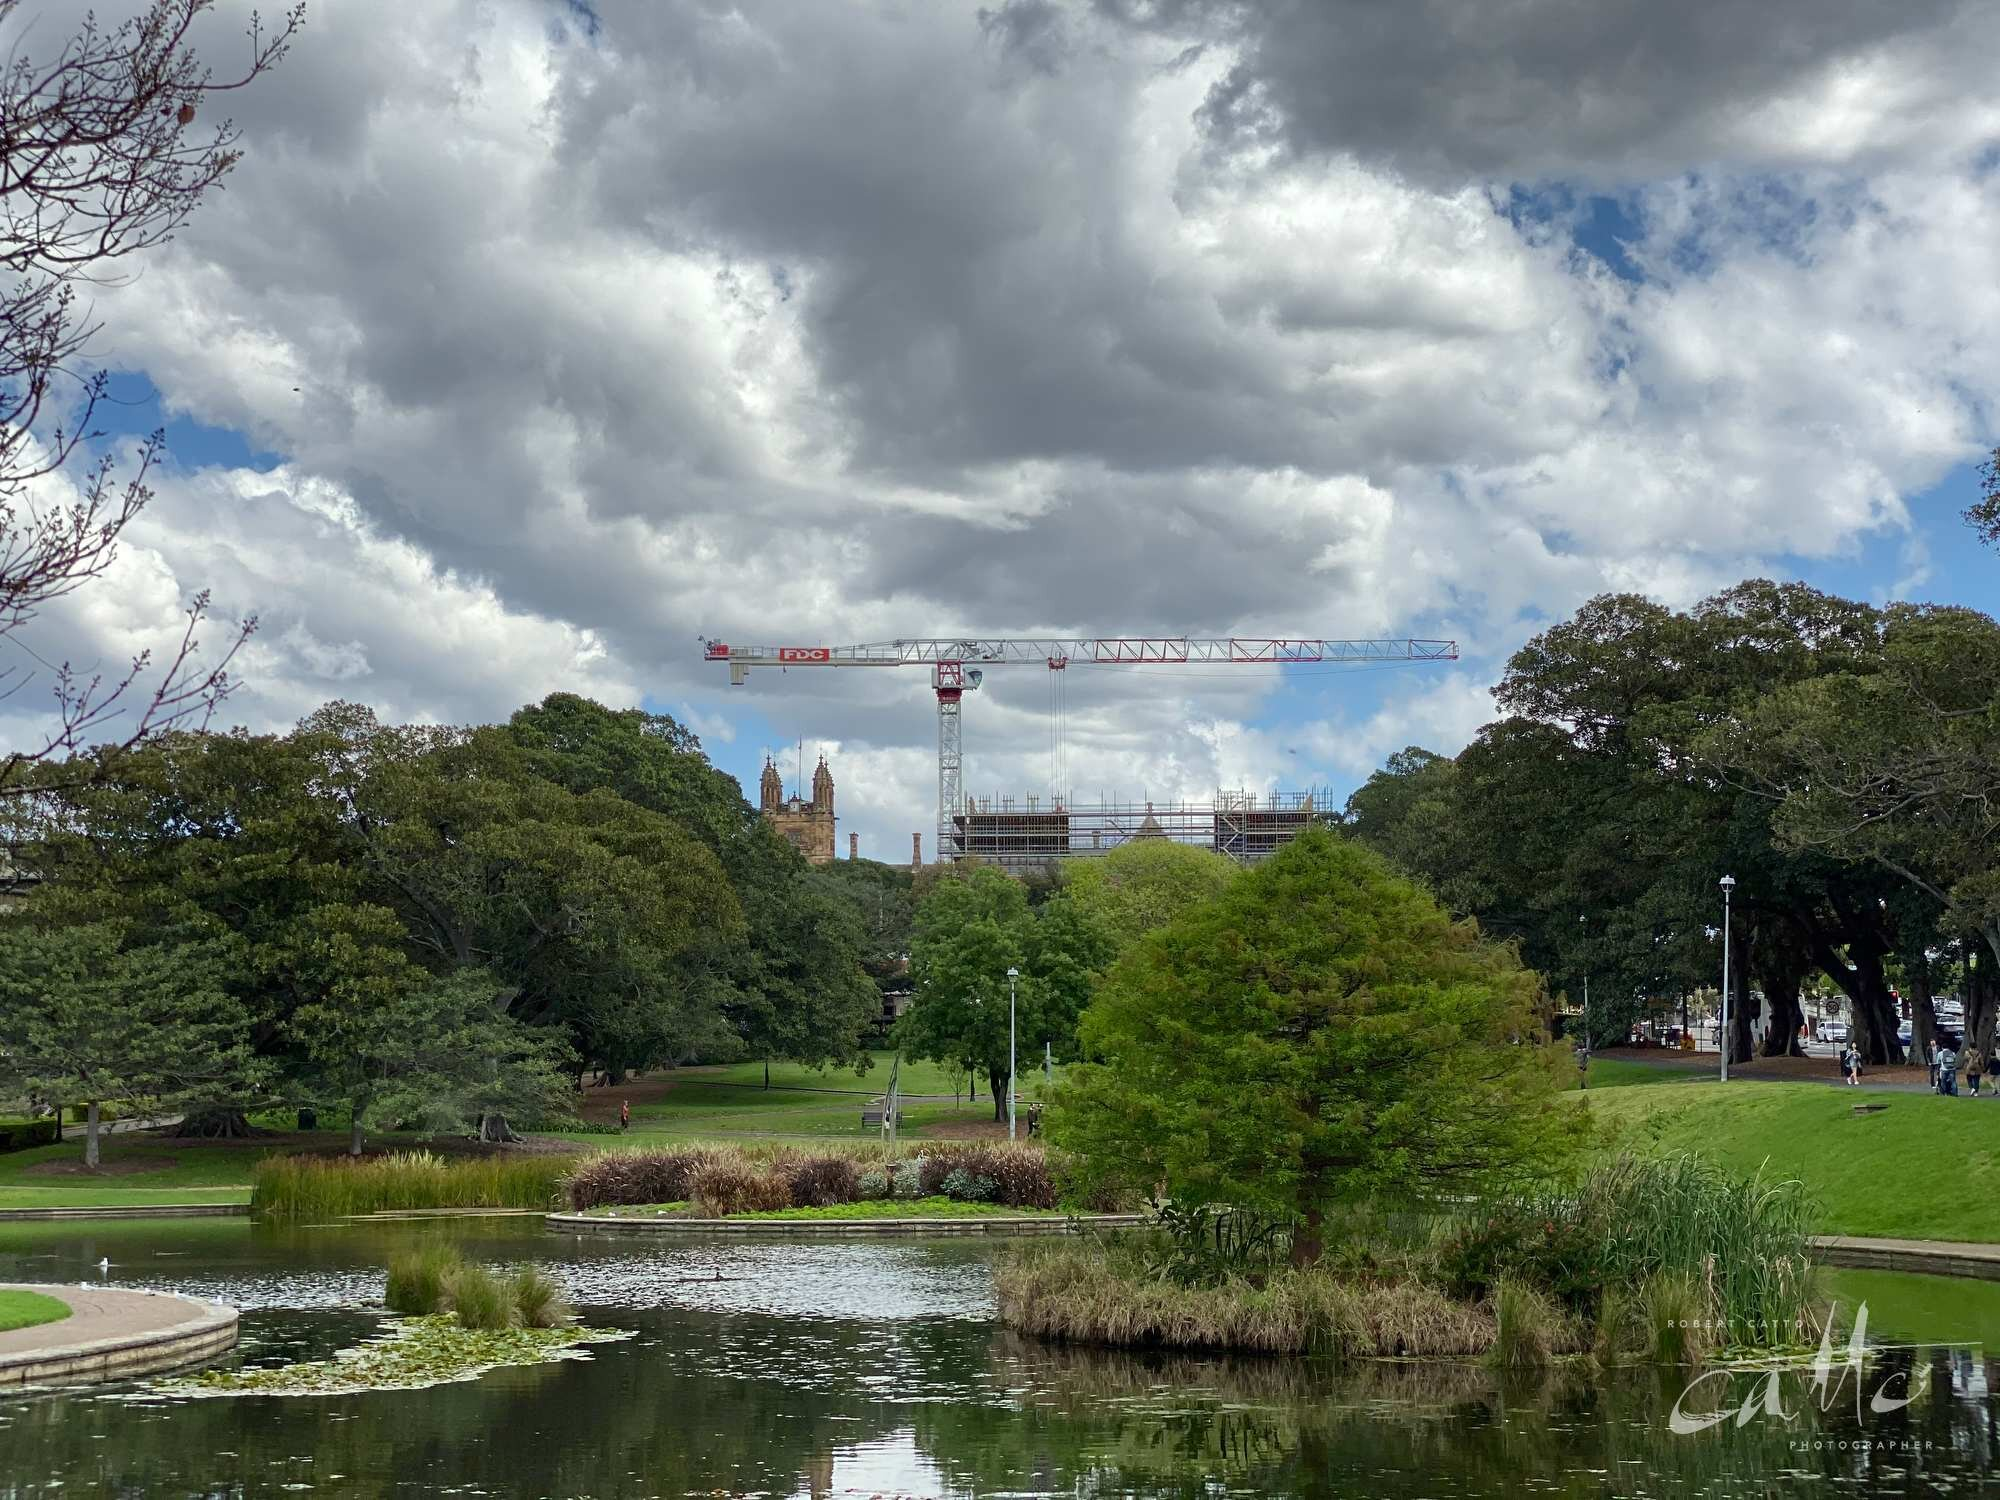 Lake Northam, Victoria Park, Sydney (iPhone 11 Pro - 2x zoom lens)